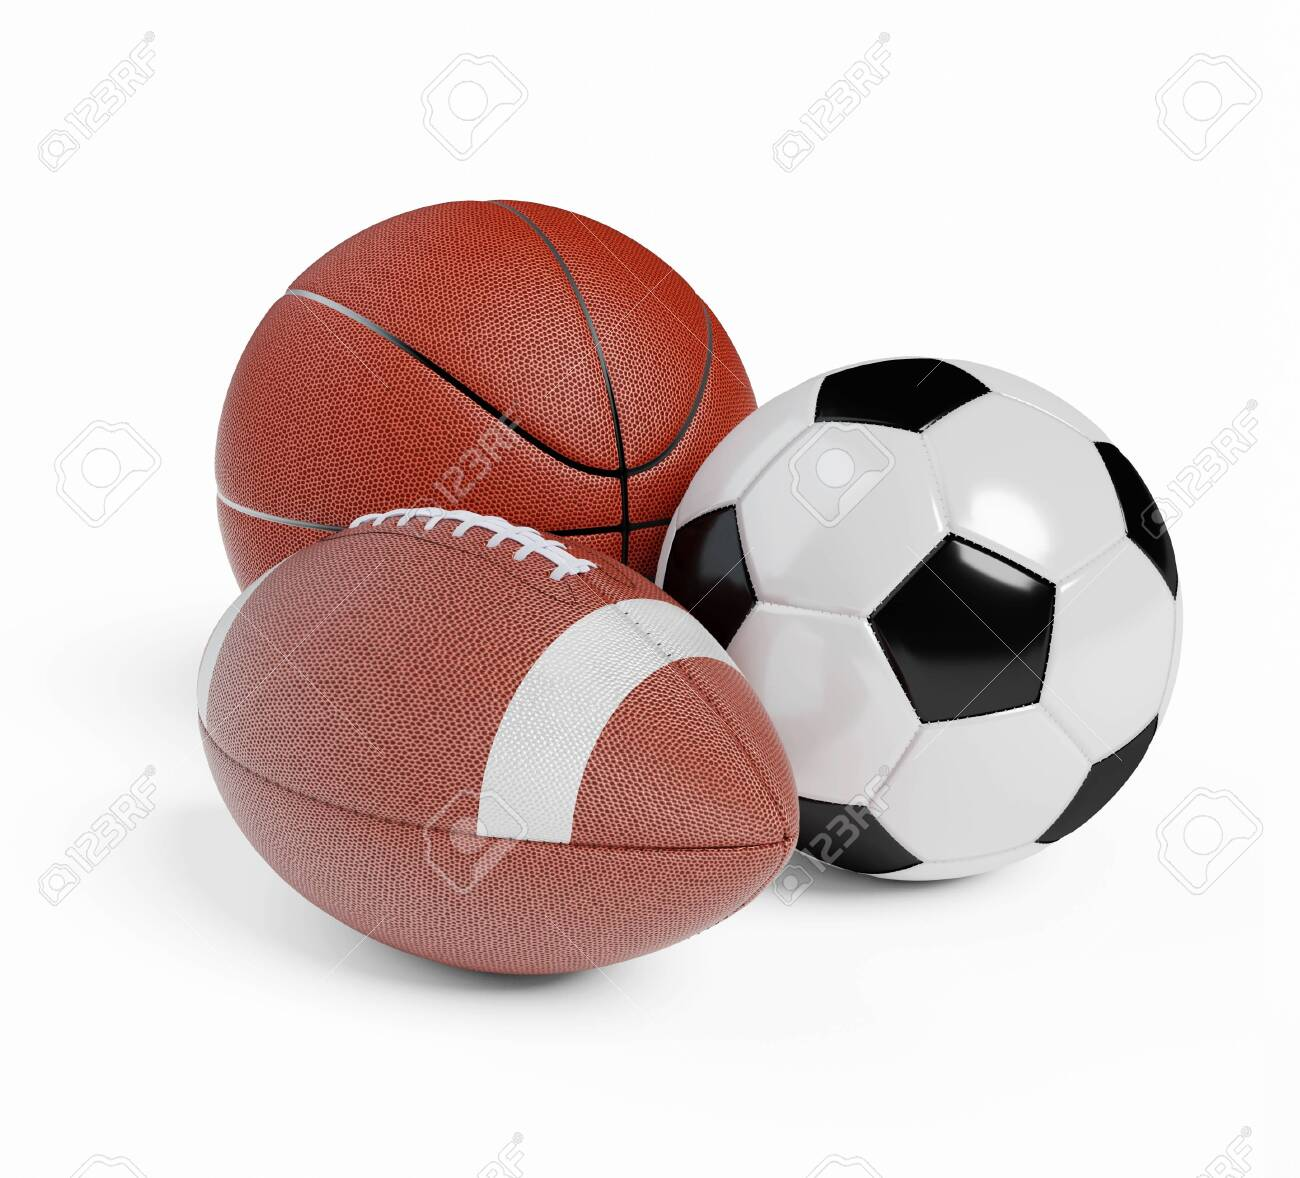 Various sports balls. Sports Equipment on White Background. Render 3d illustration - 137766156